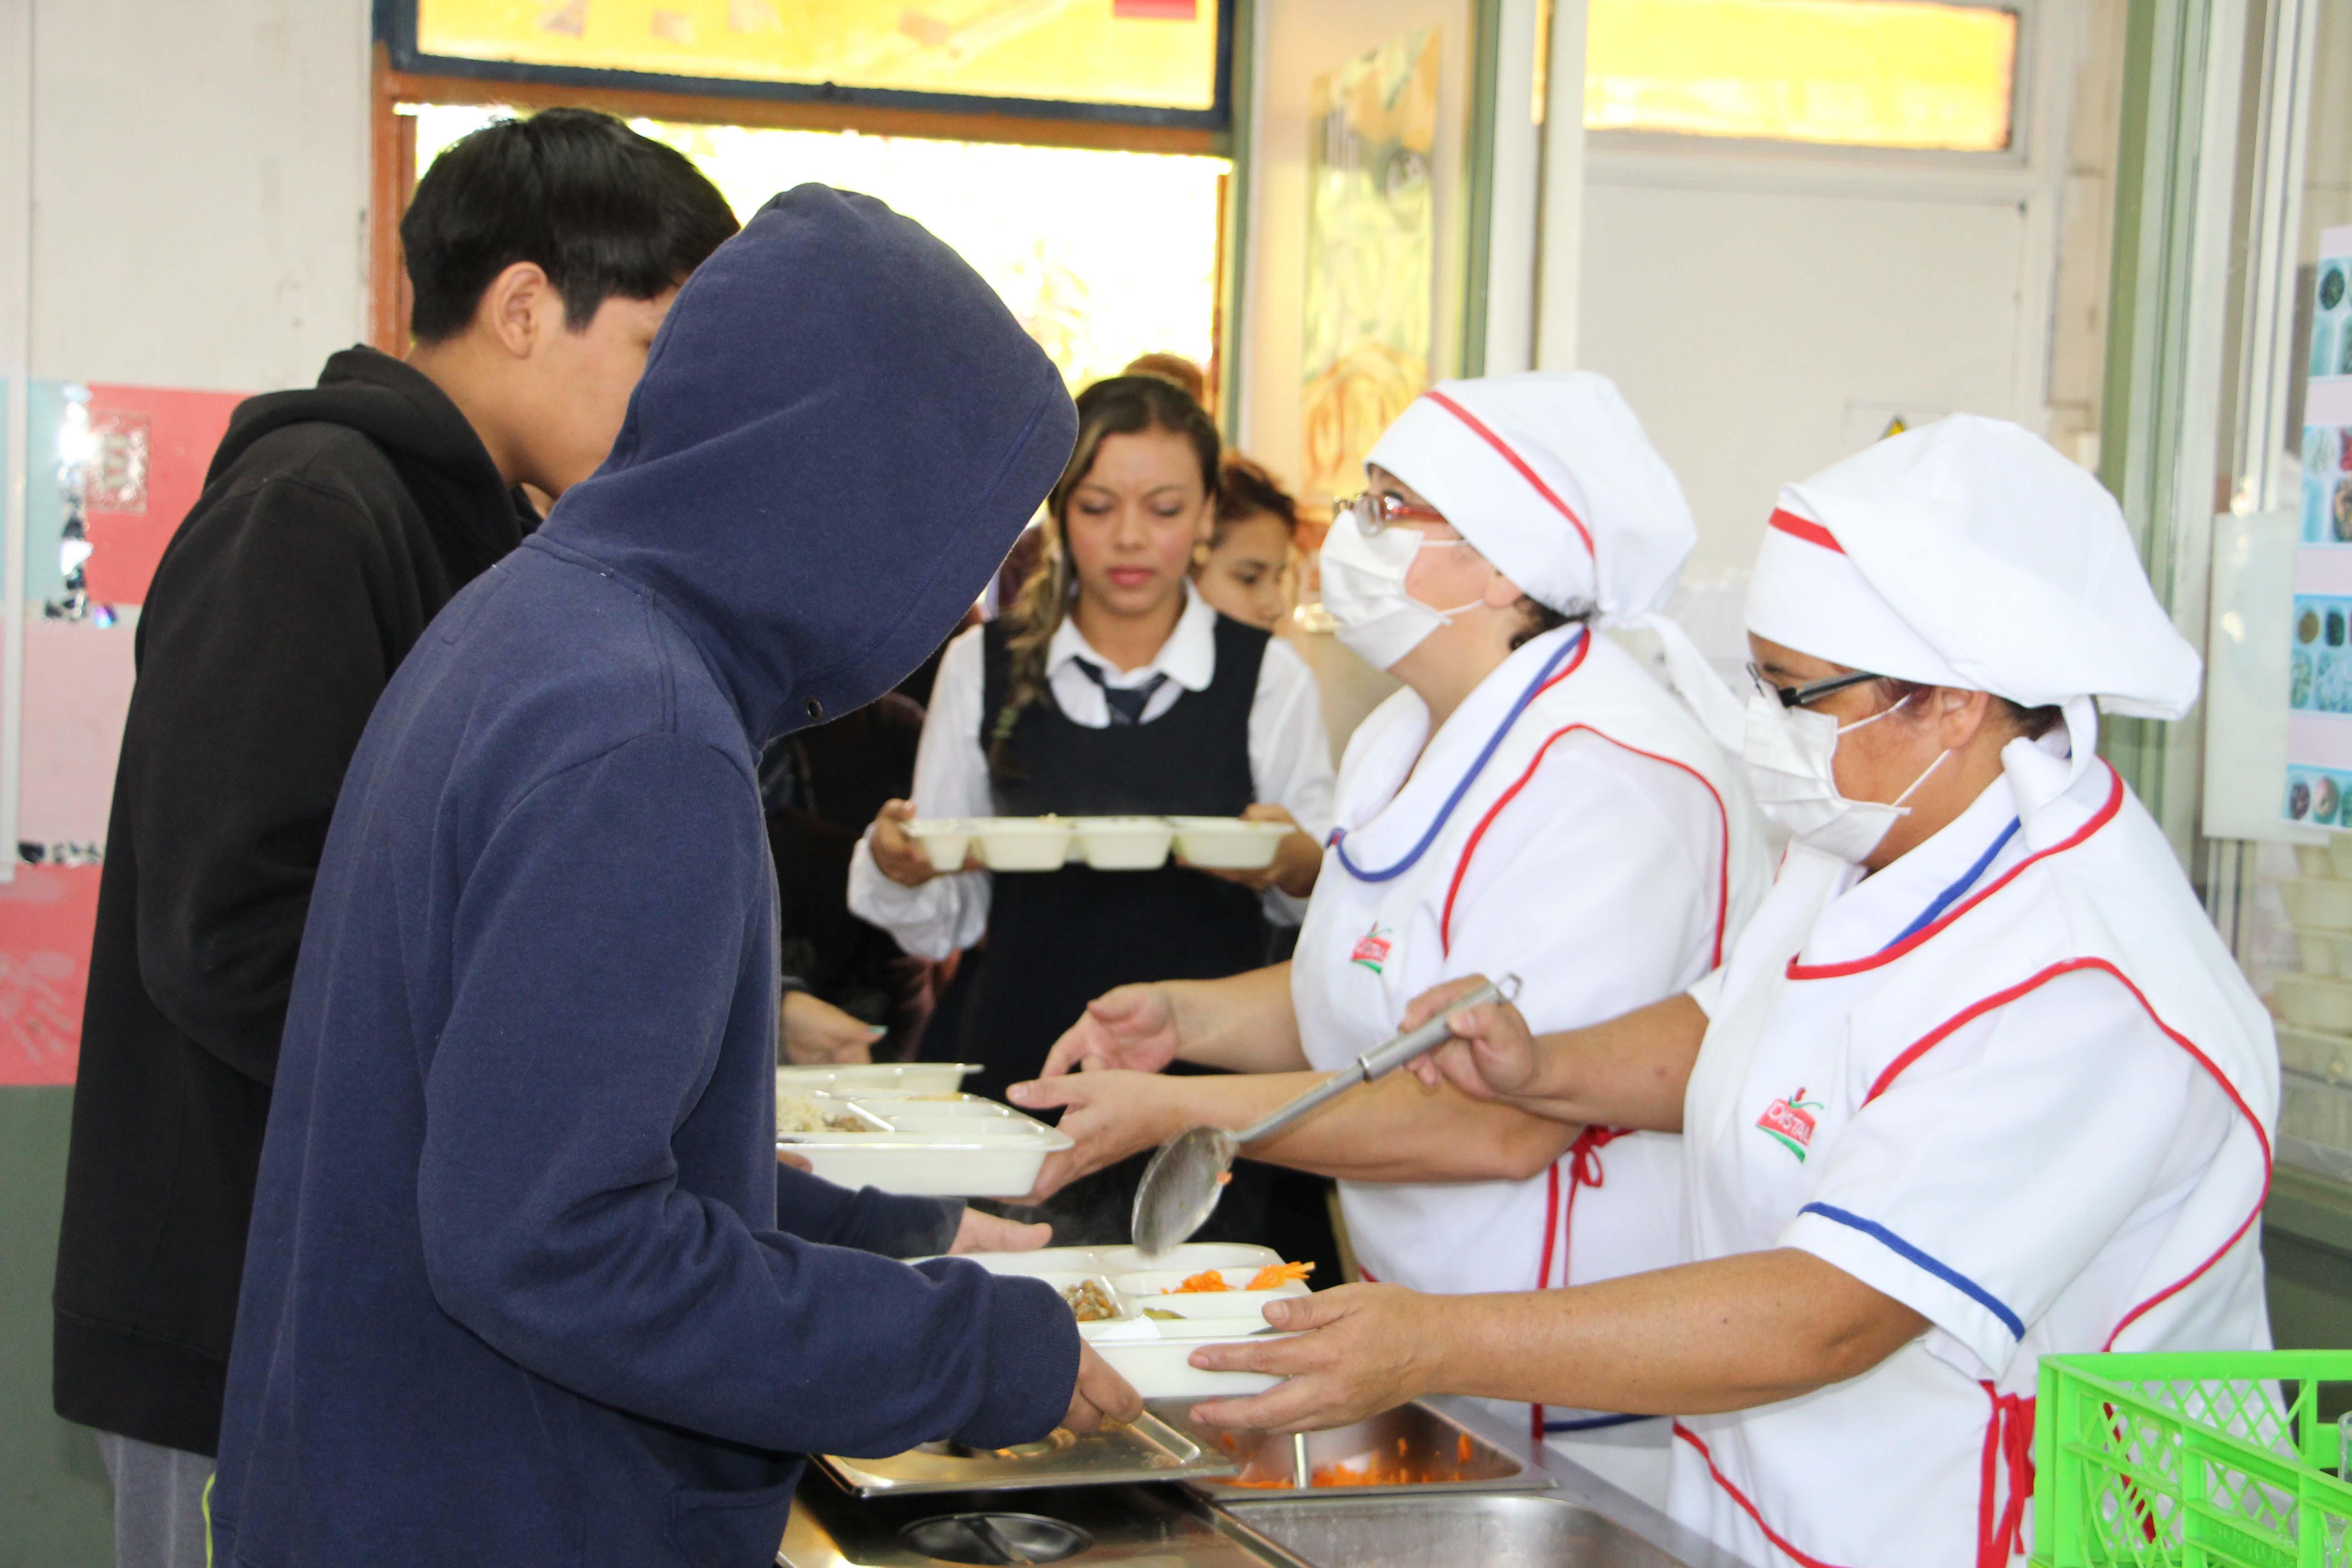 Delegación internacional visita liceo B79 para conocer exitoso programa de alimentación escolar